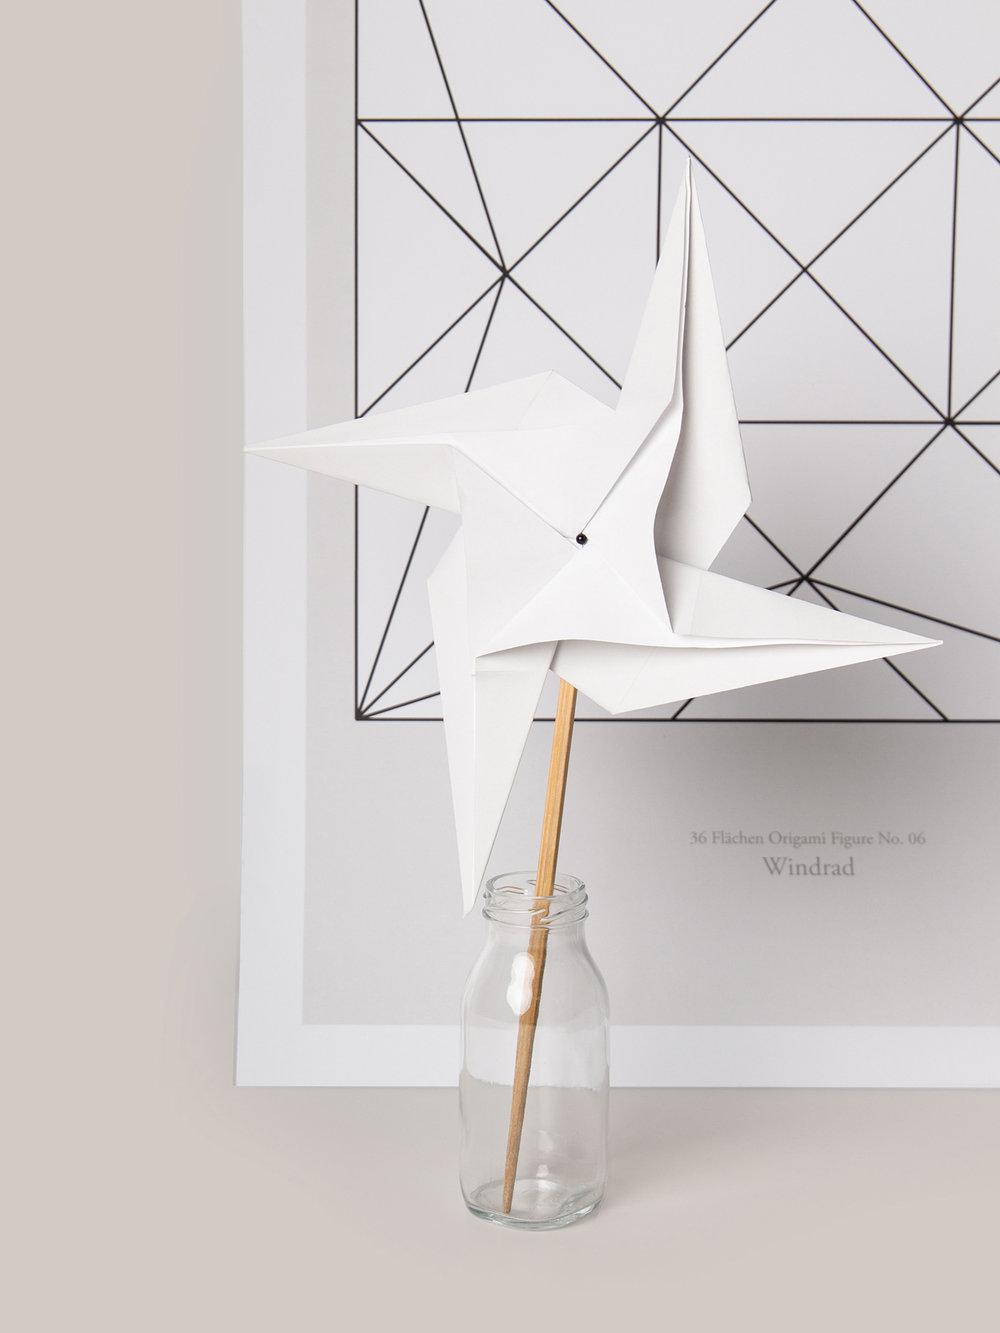 Origami Figur Windrad mit passendem Print  Origami figure Pinwheel with adequate print